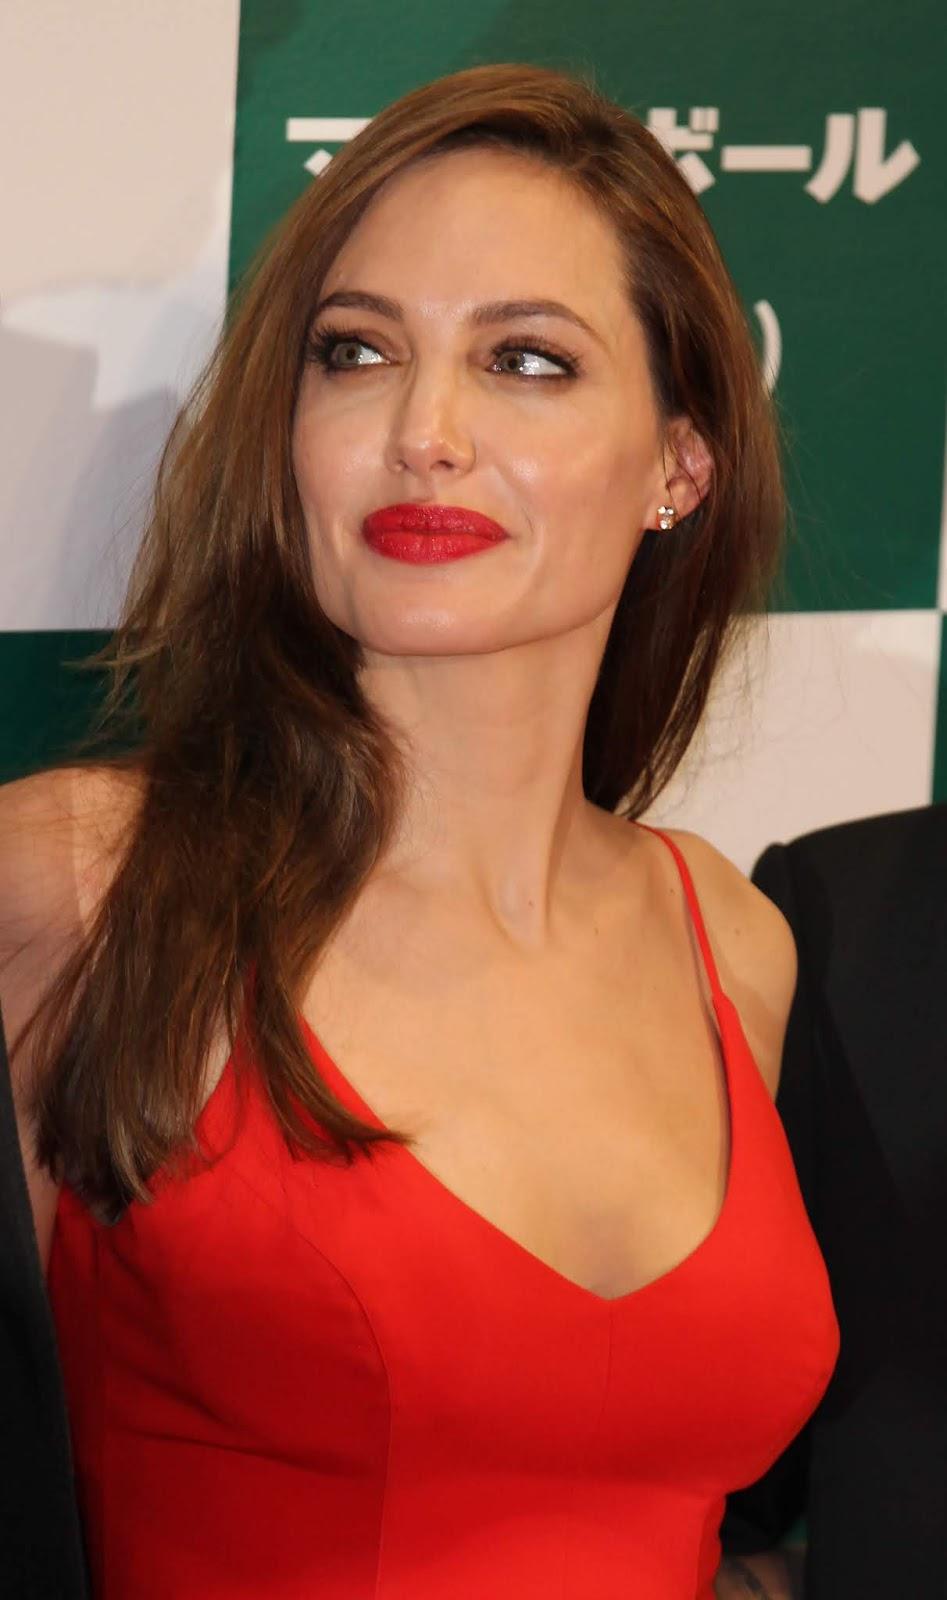 Angelina Jolie donated $1 million